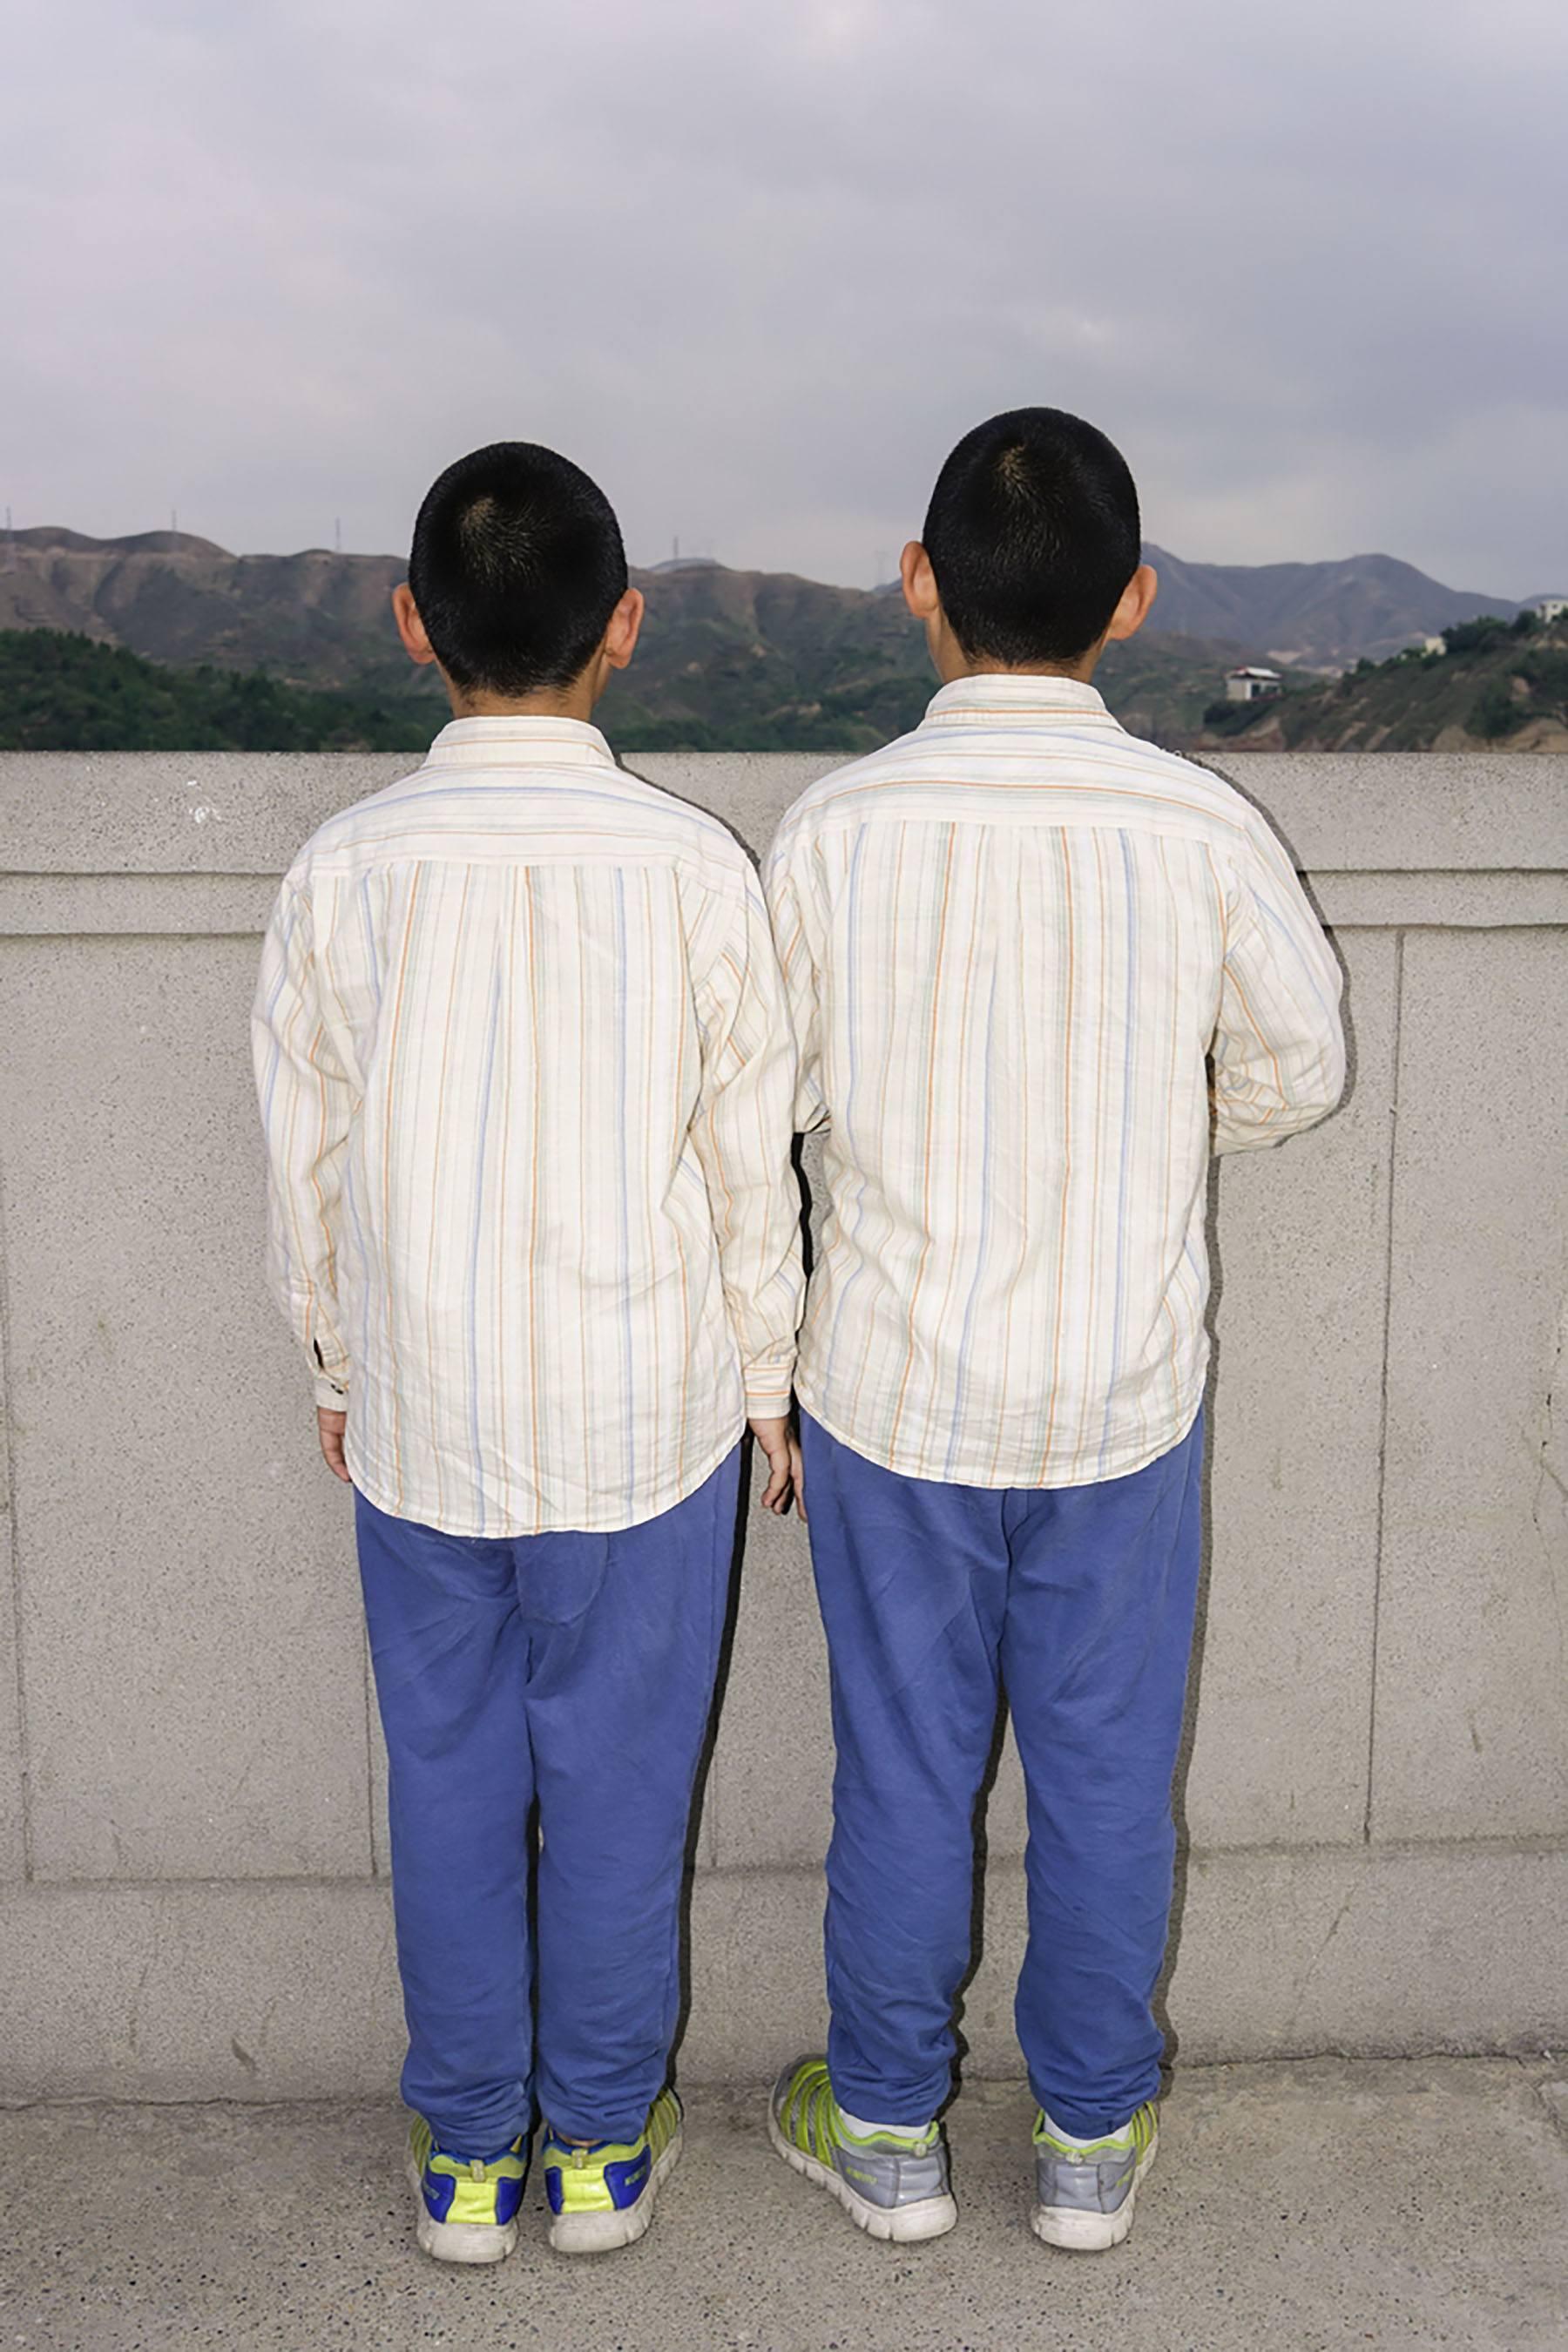 IGNANT-Photography-Wang-Yishu-Borderless-9